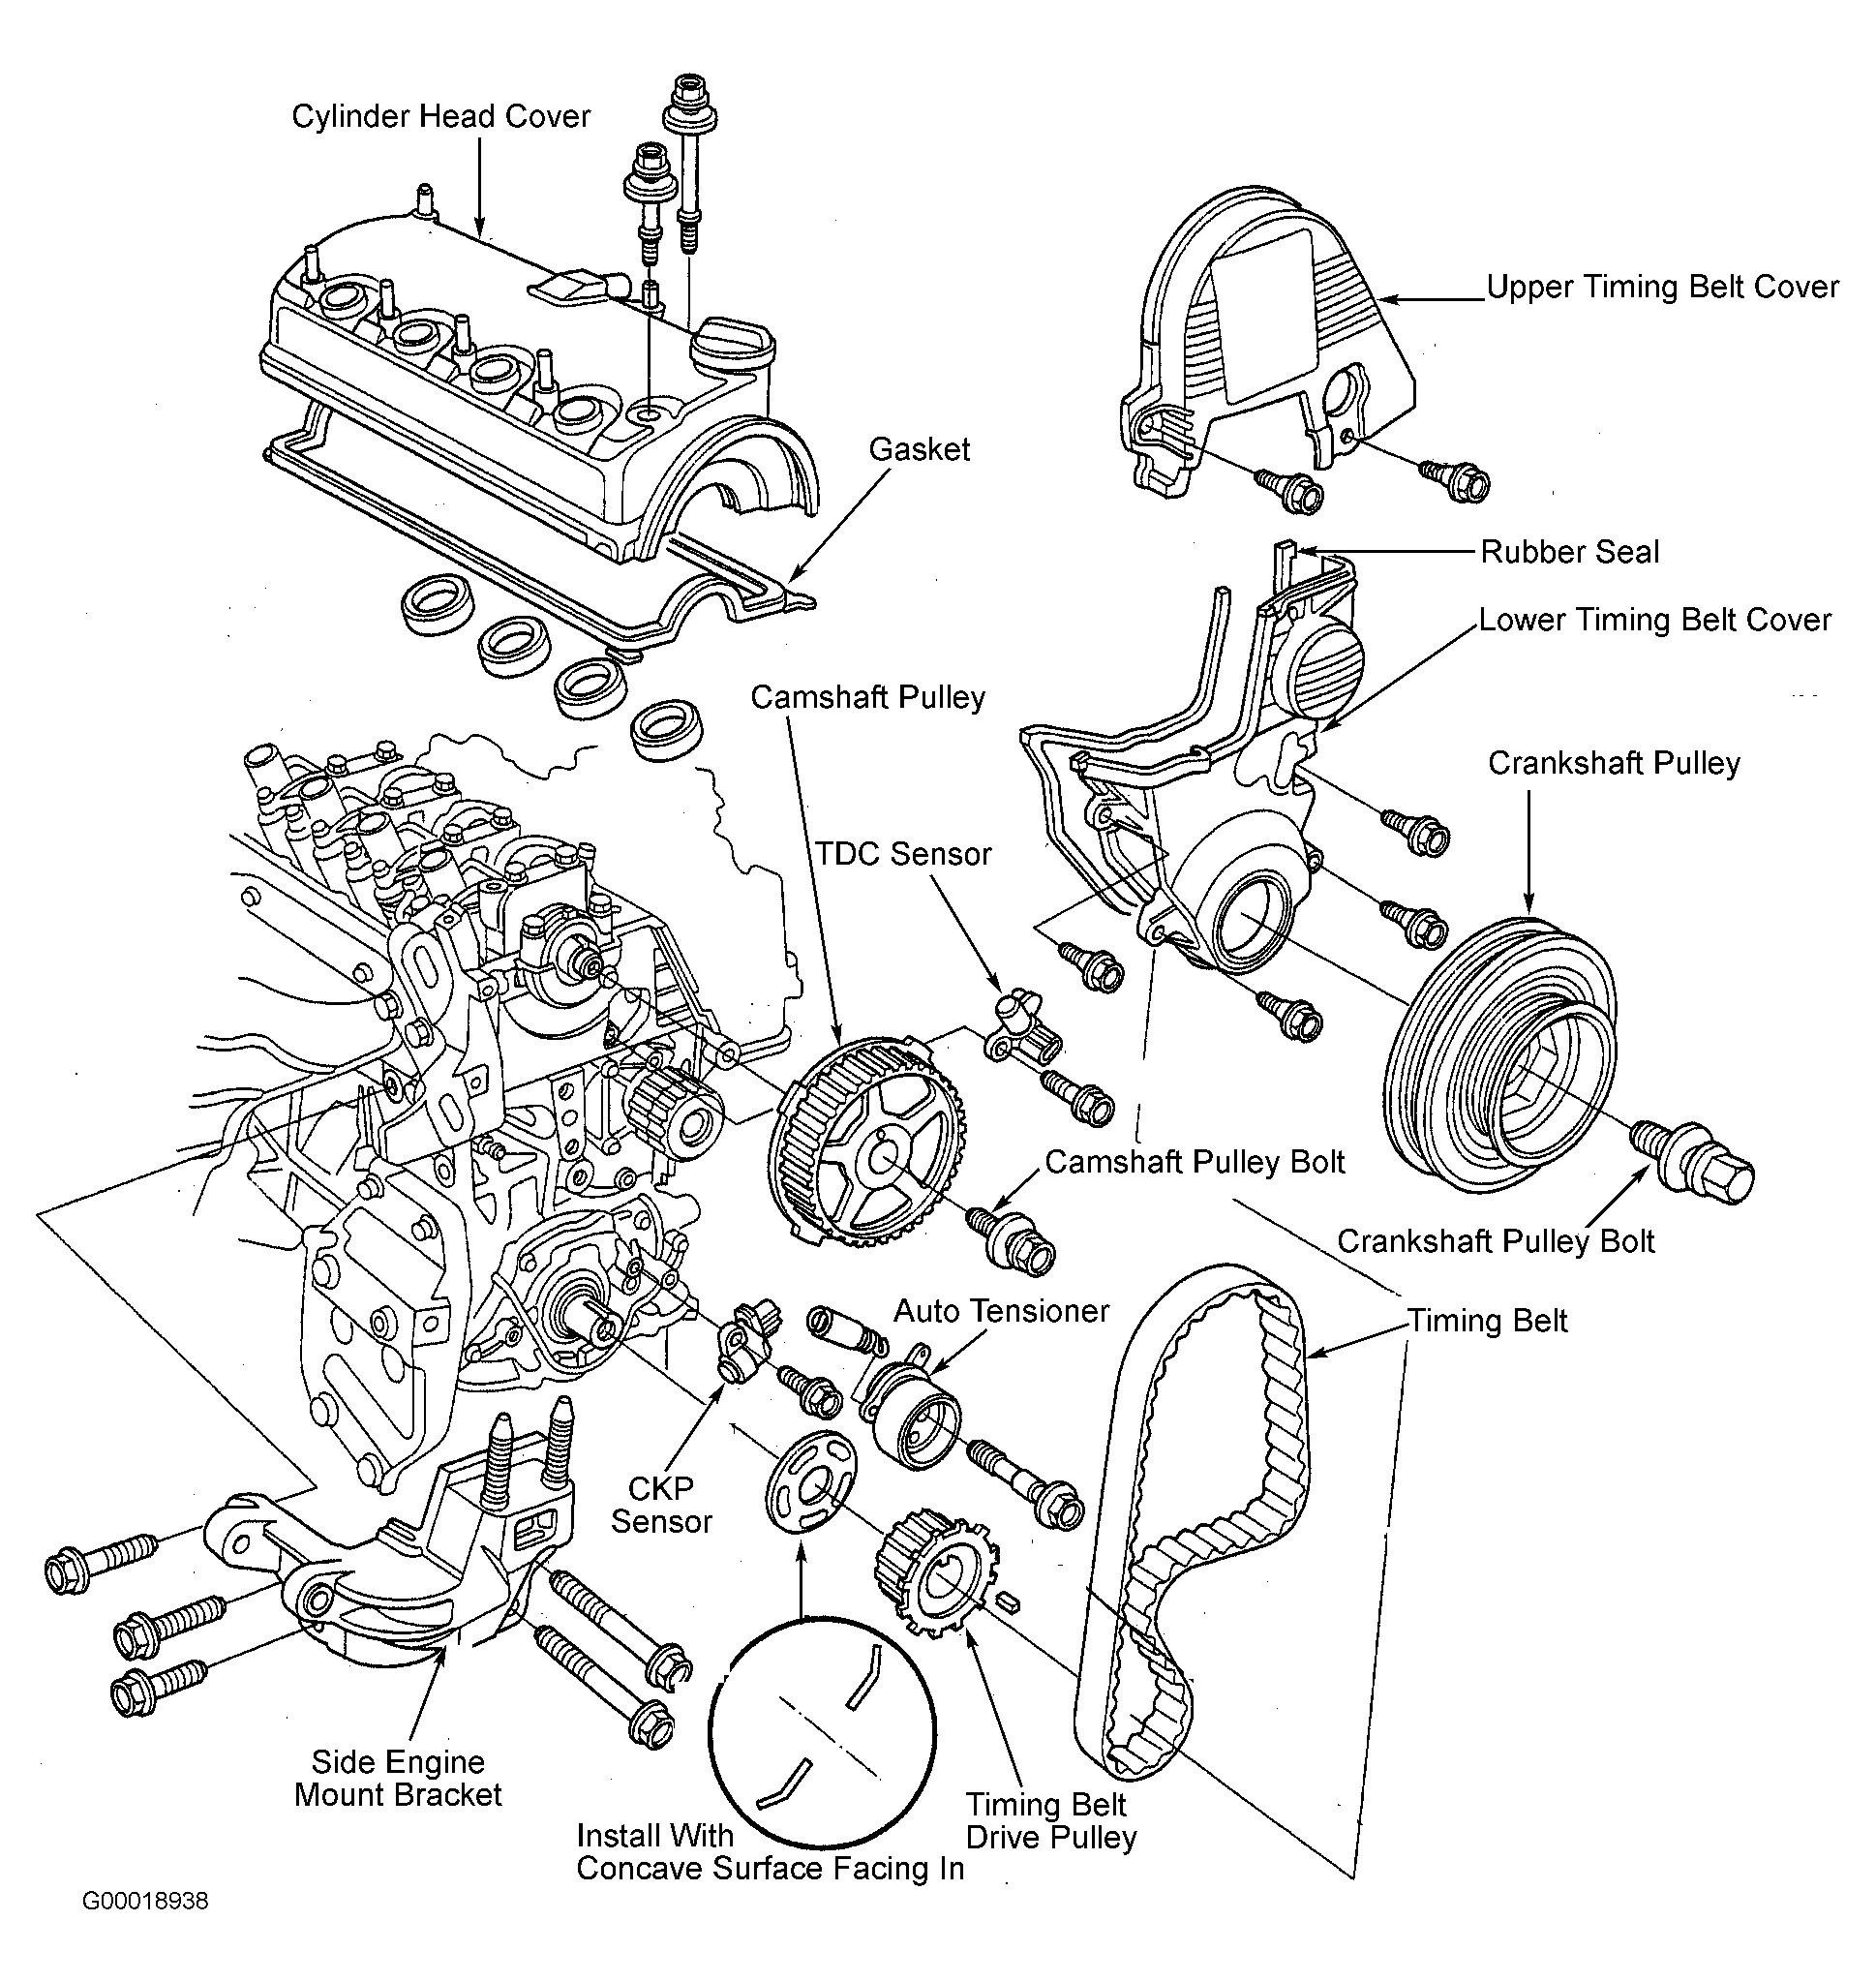 Honda Civic 1998 Engine Diagram 1996 Accord Ignition Wiring Motor Parts Of